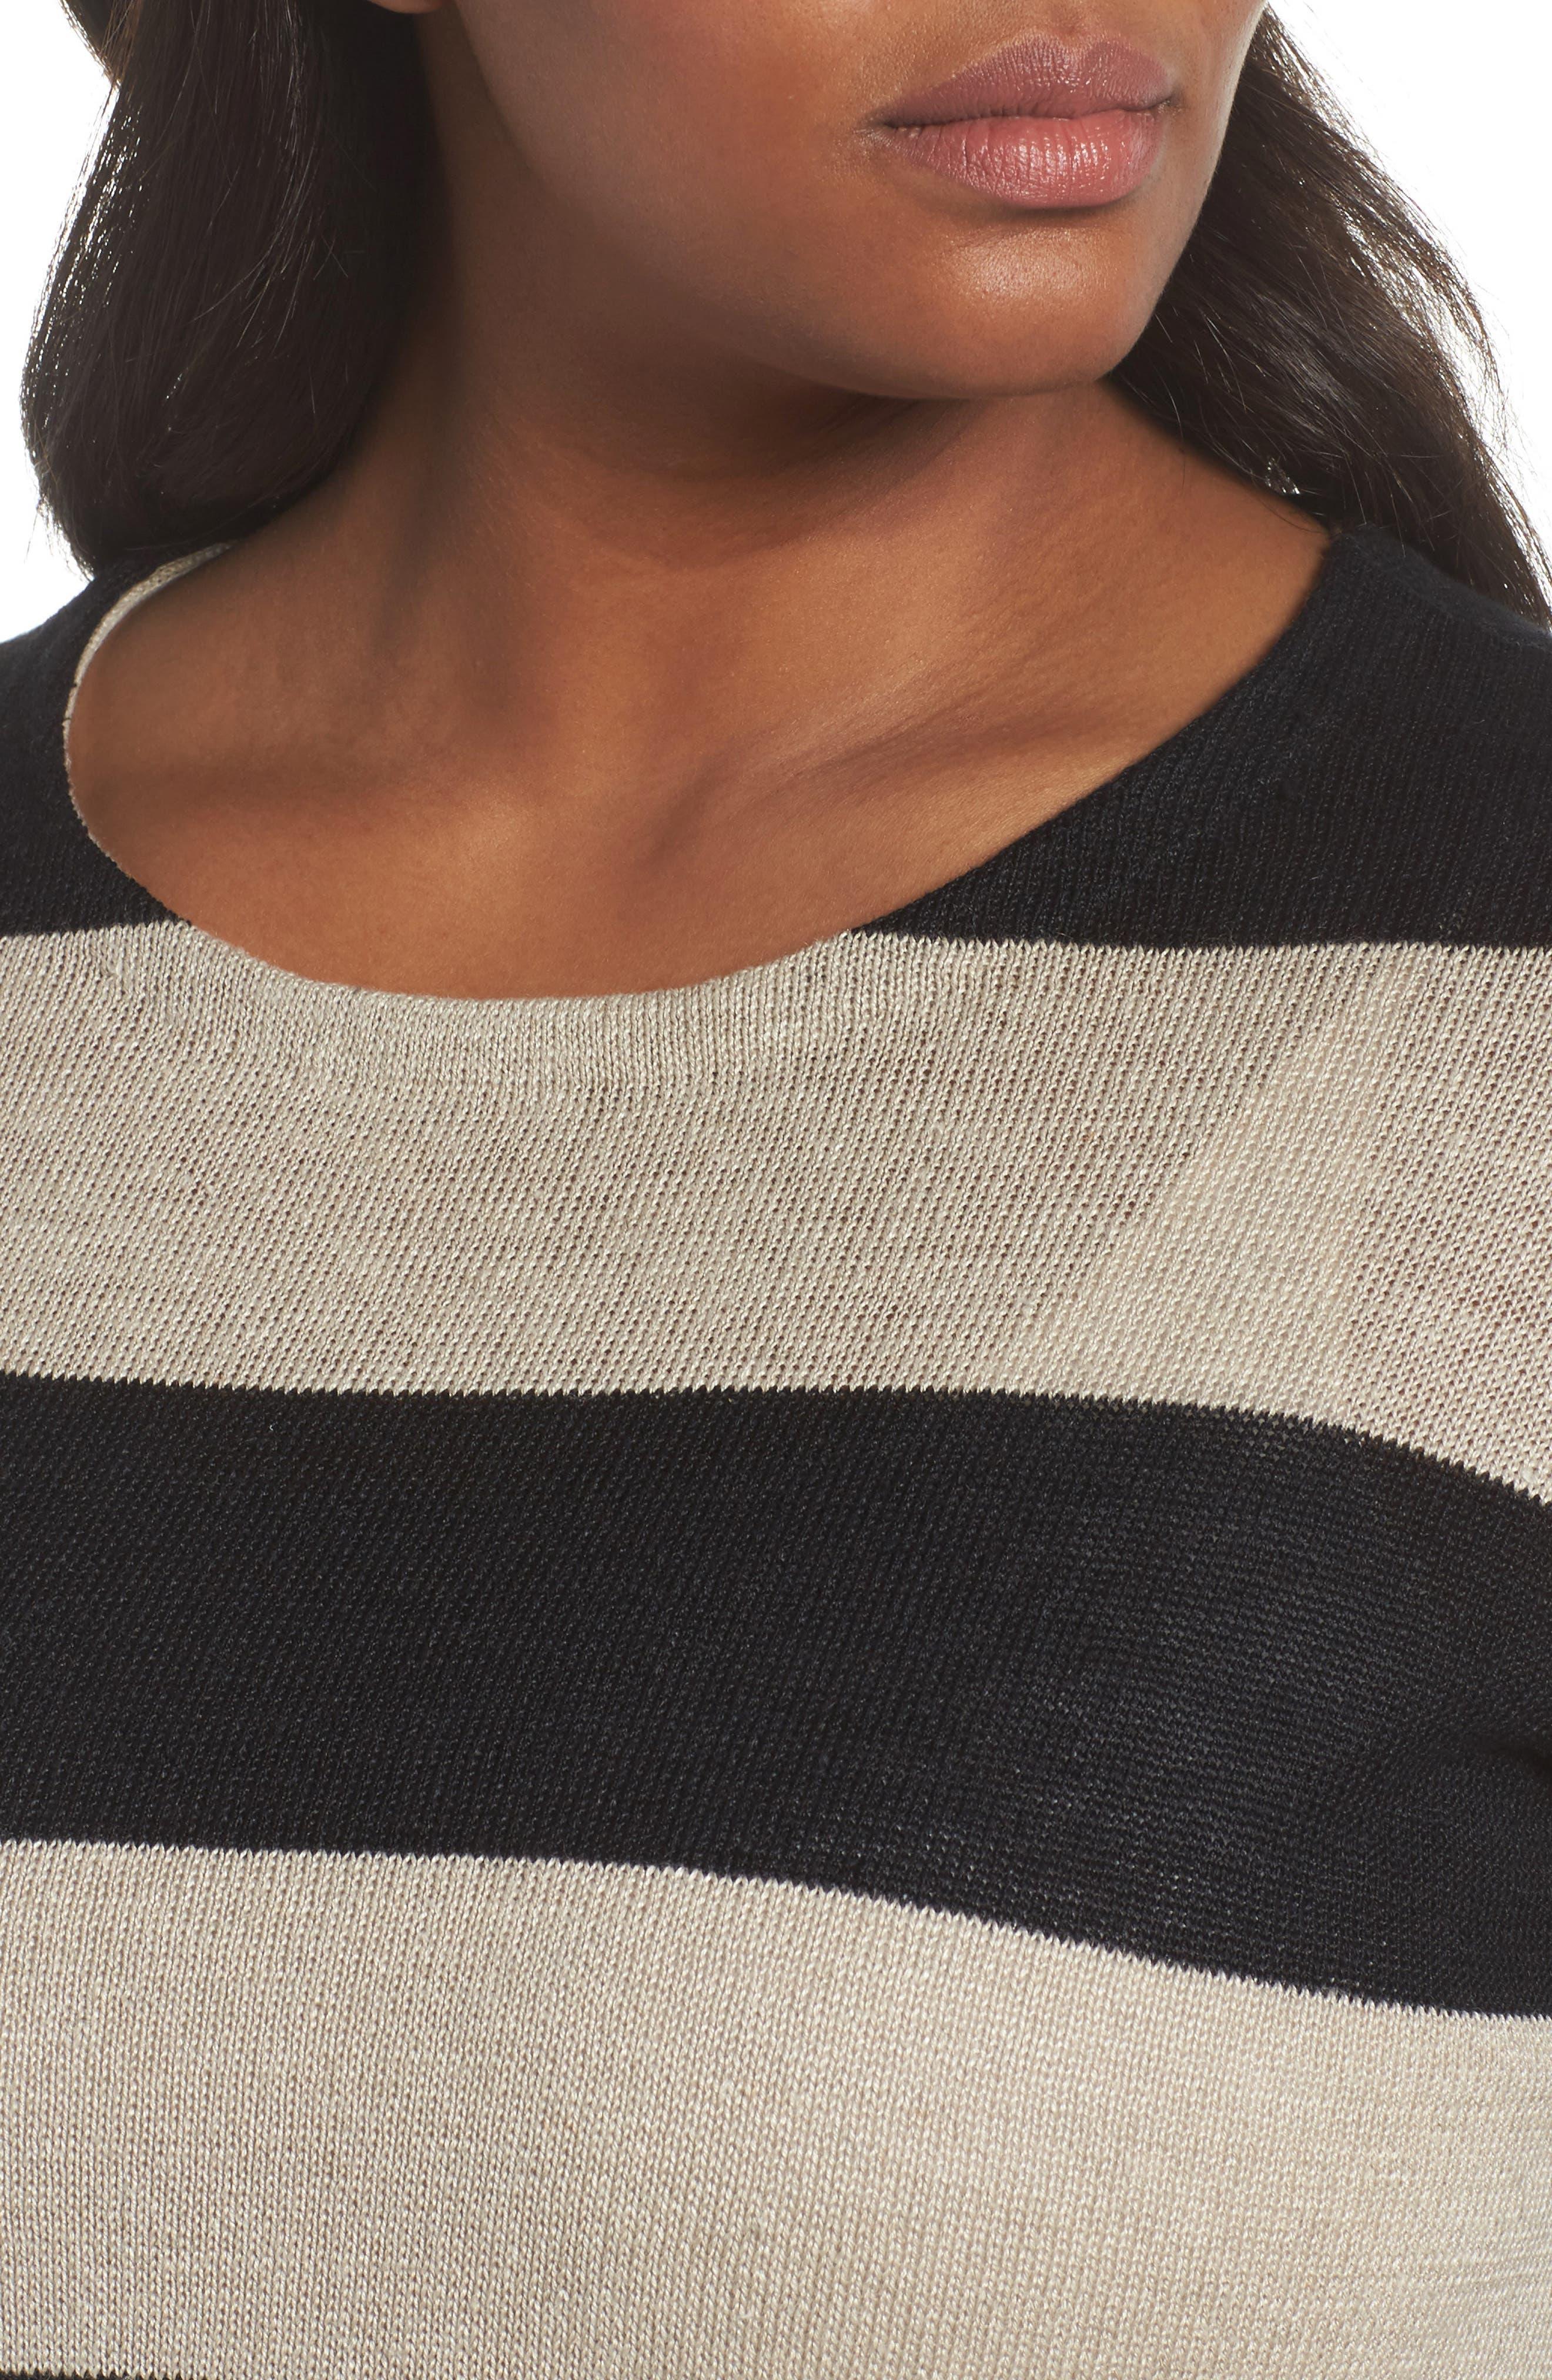 Stripe Linen Sweater,                             Alternate thumbnail 4, color,                             008